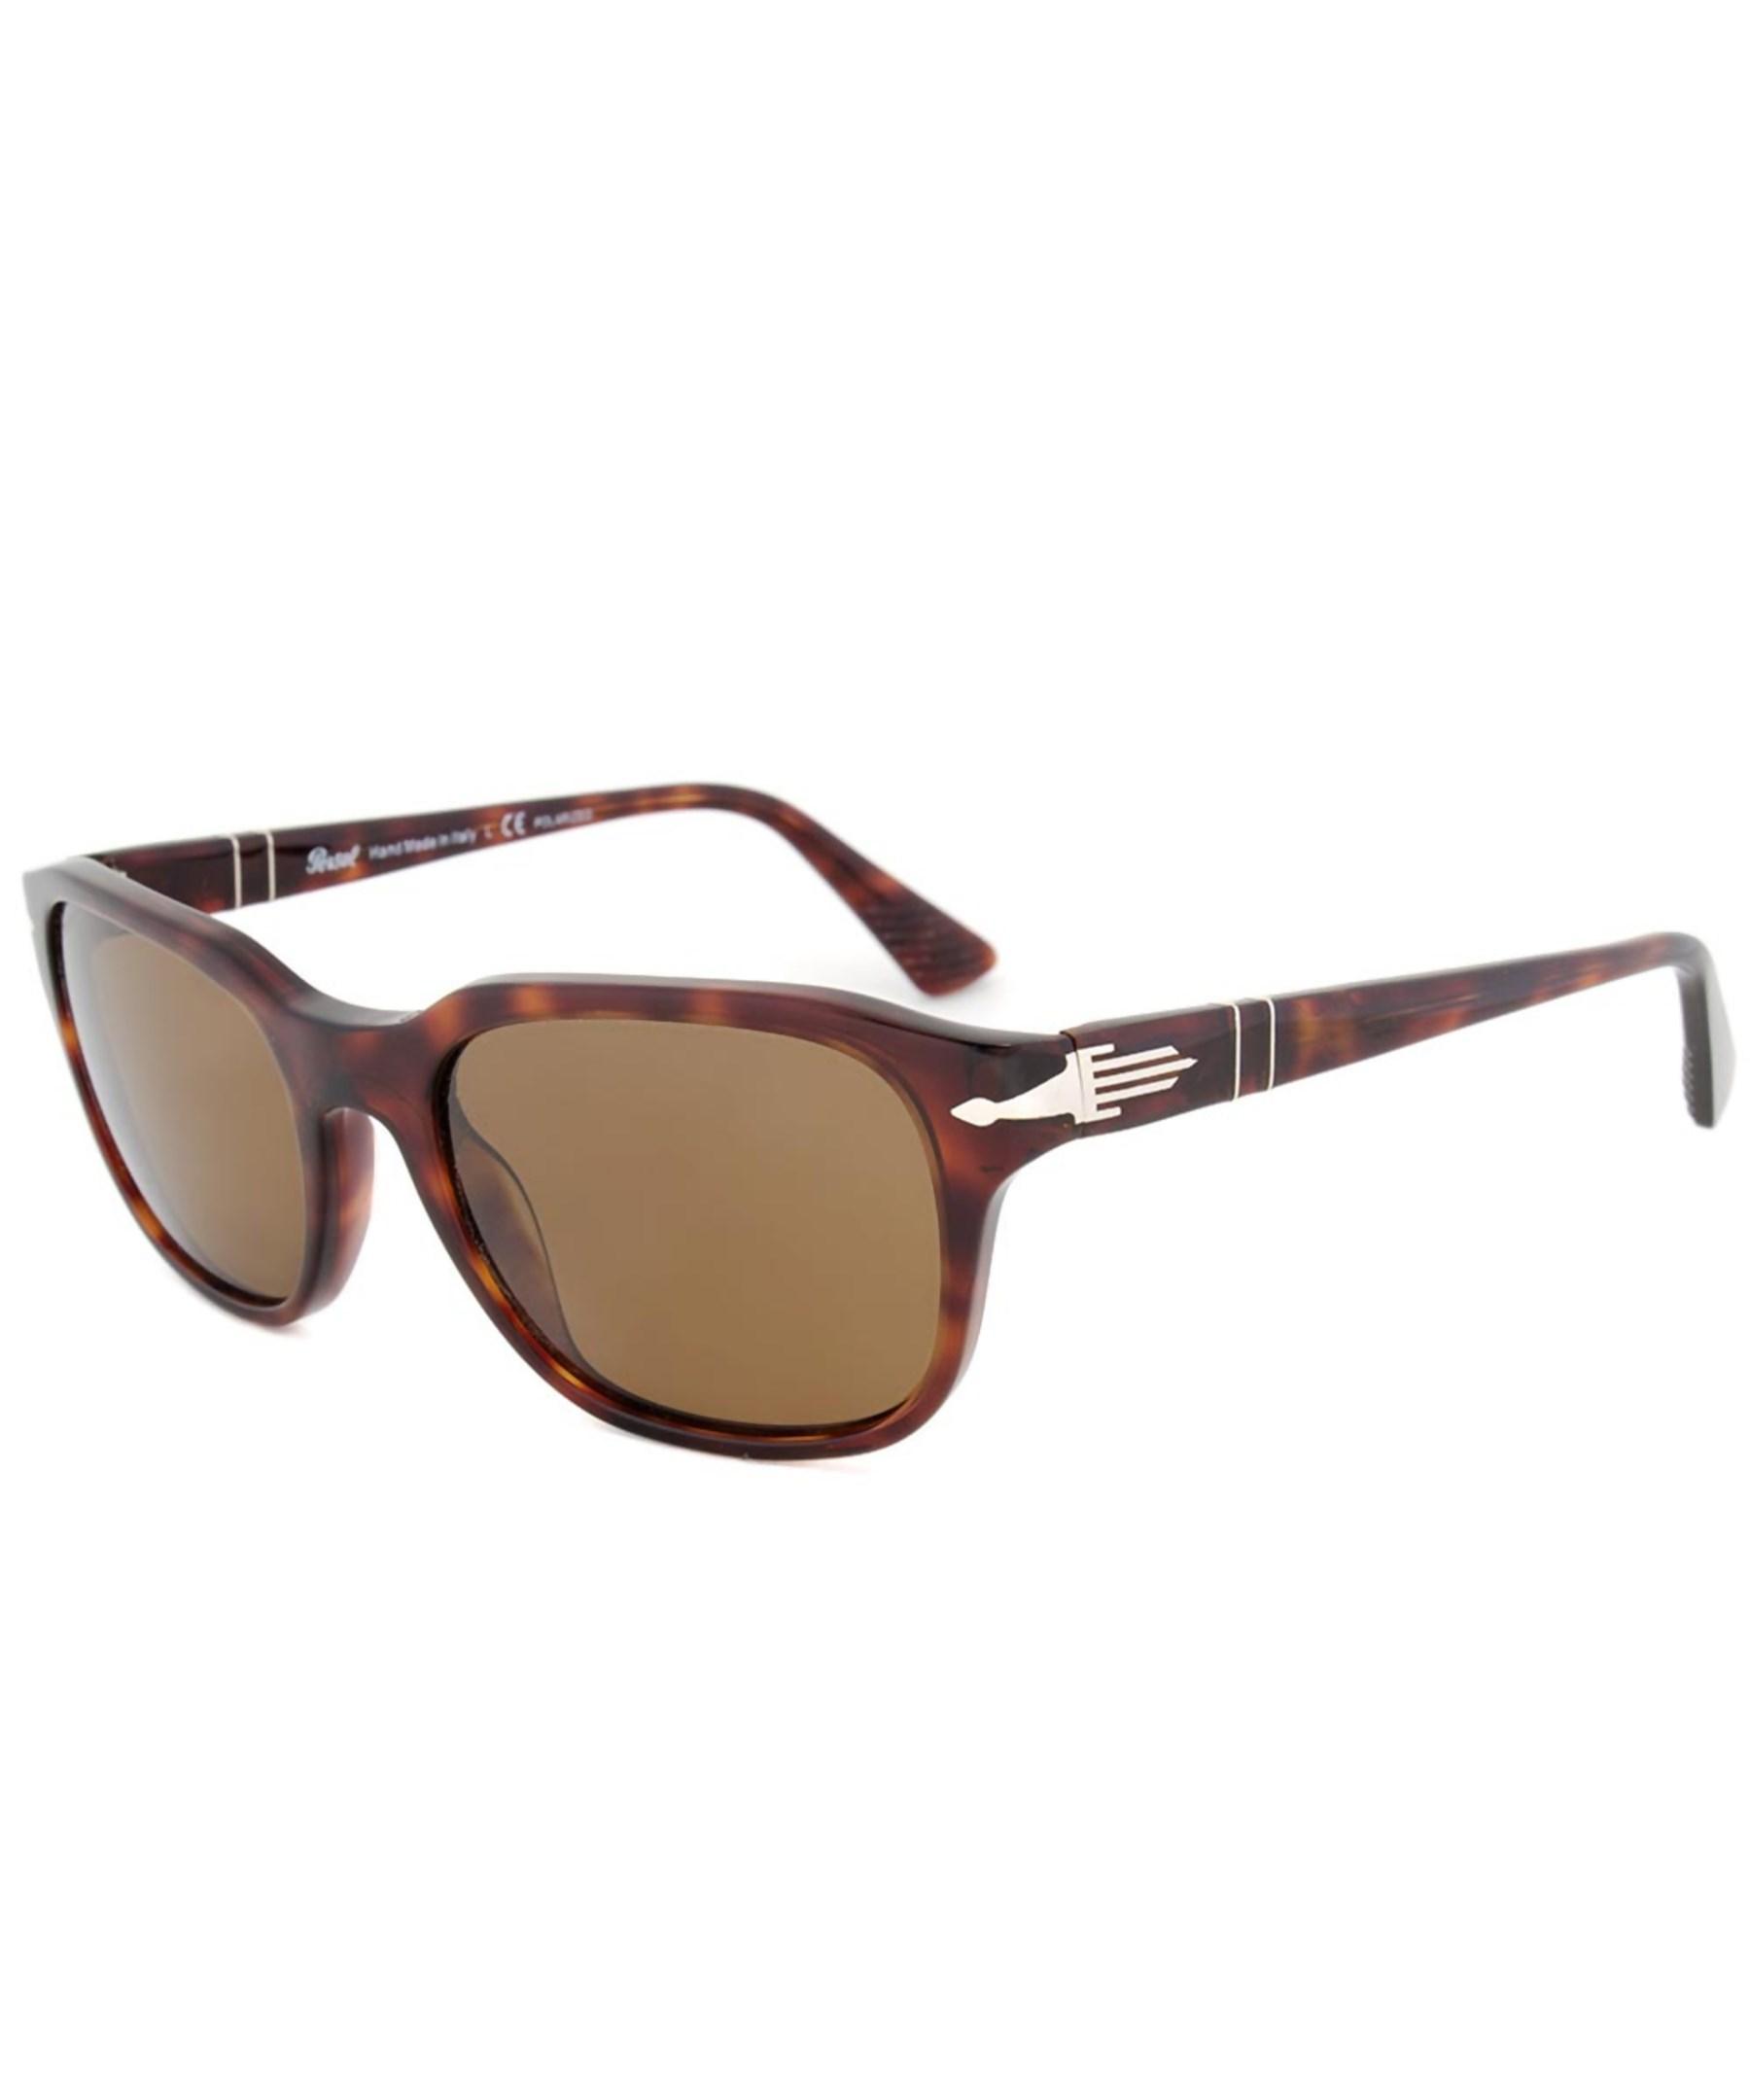 16f91d2873 Persol 714 Sunglasses 2457